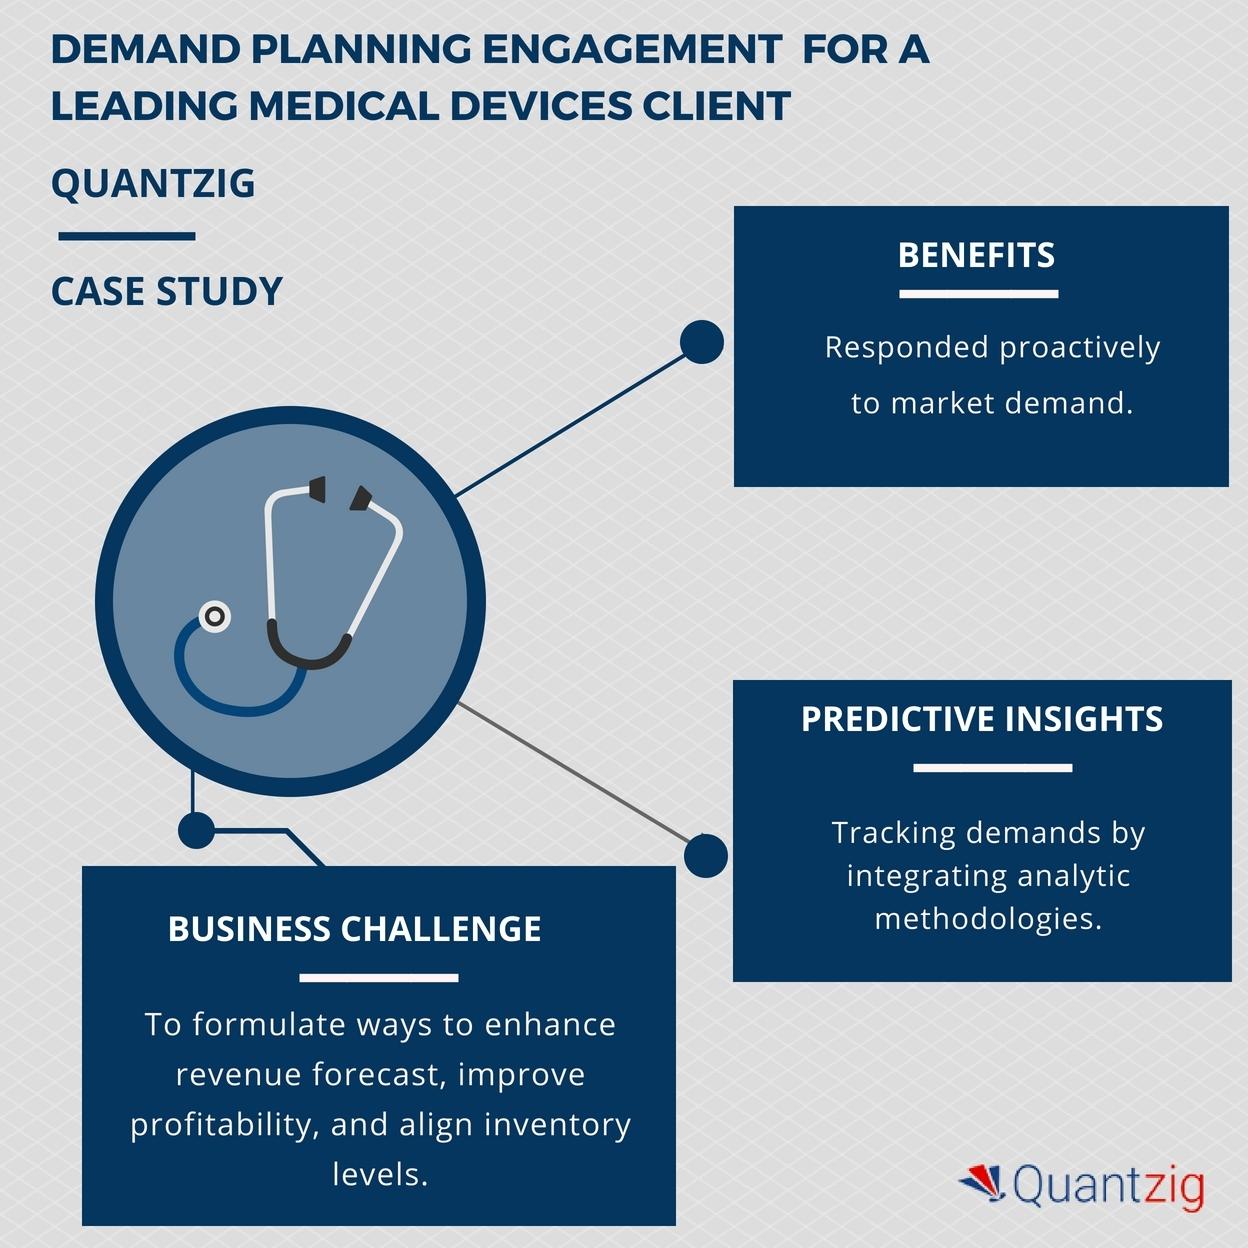 Demand Planning Engagement for a Medical Device Manufacturer Helped